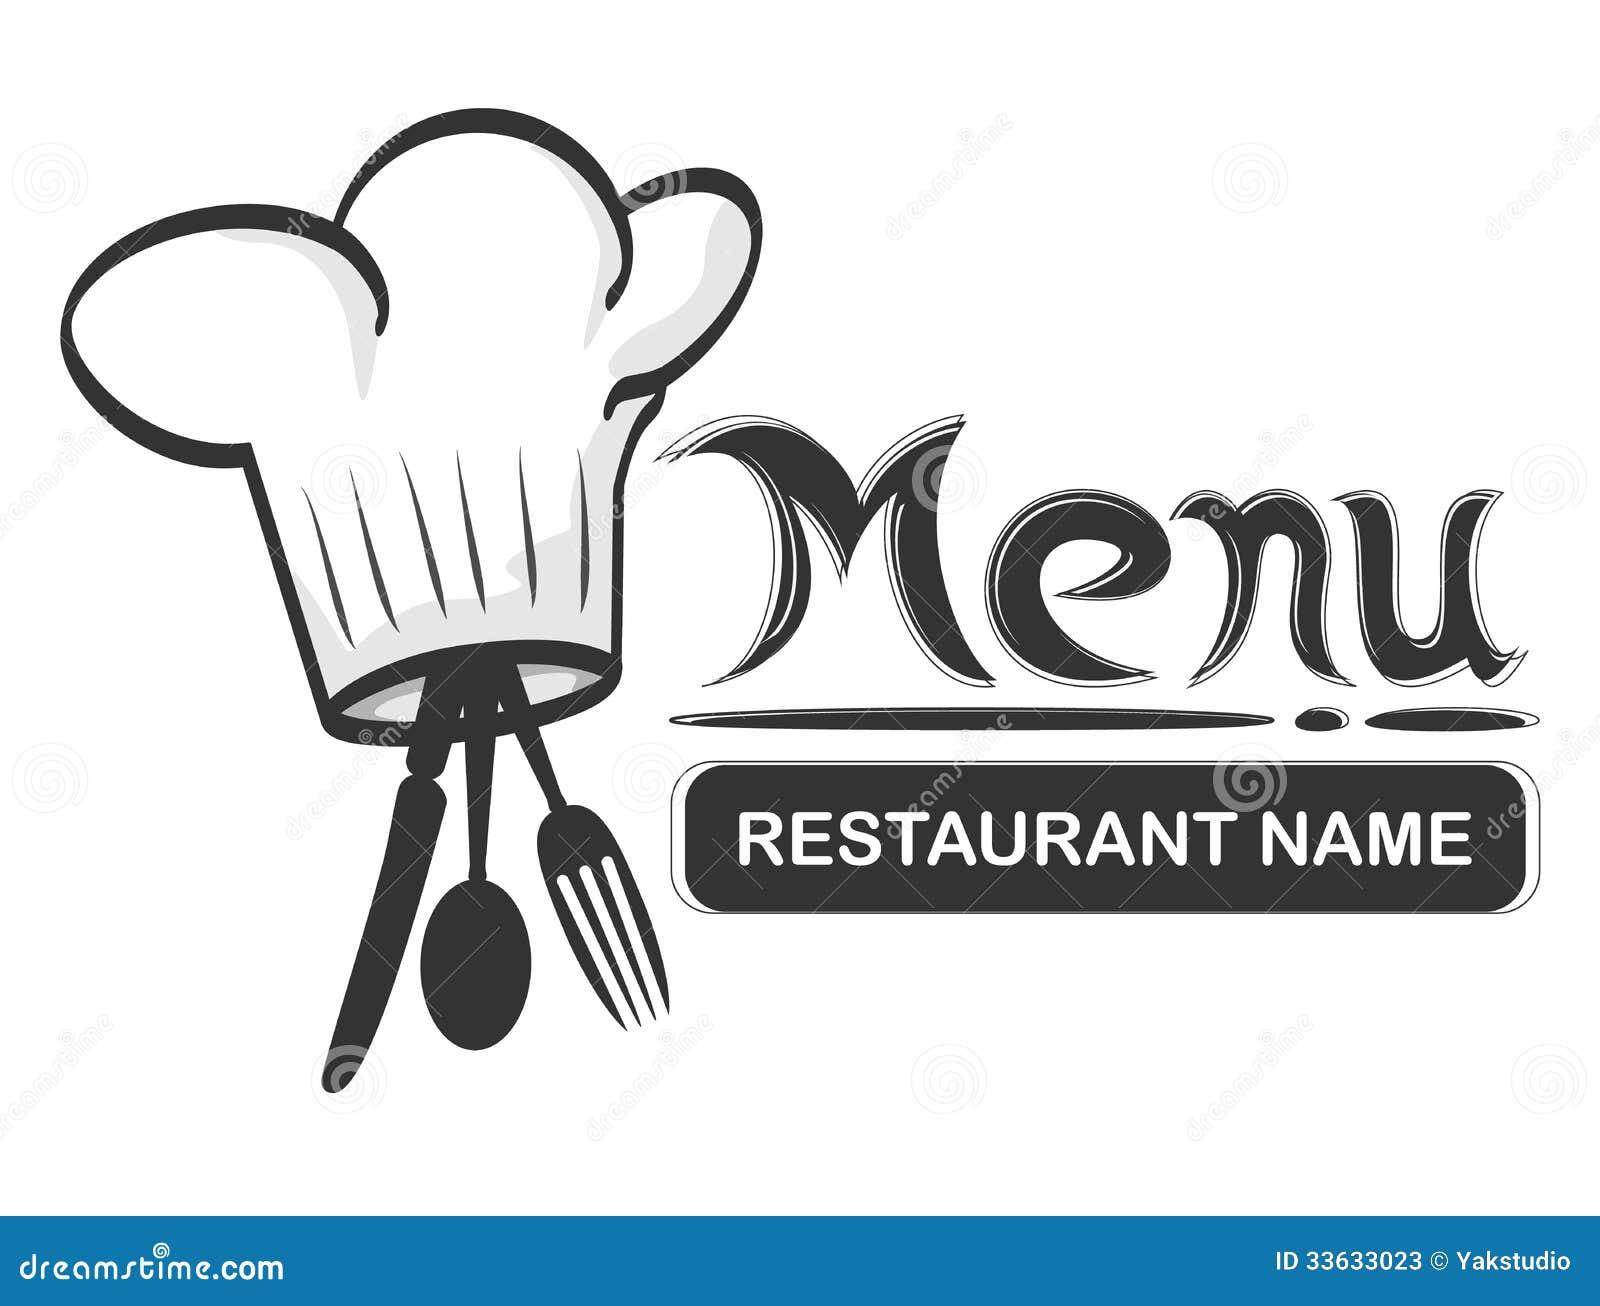 image logo restaurant